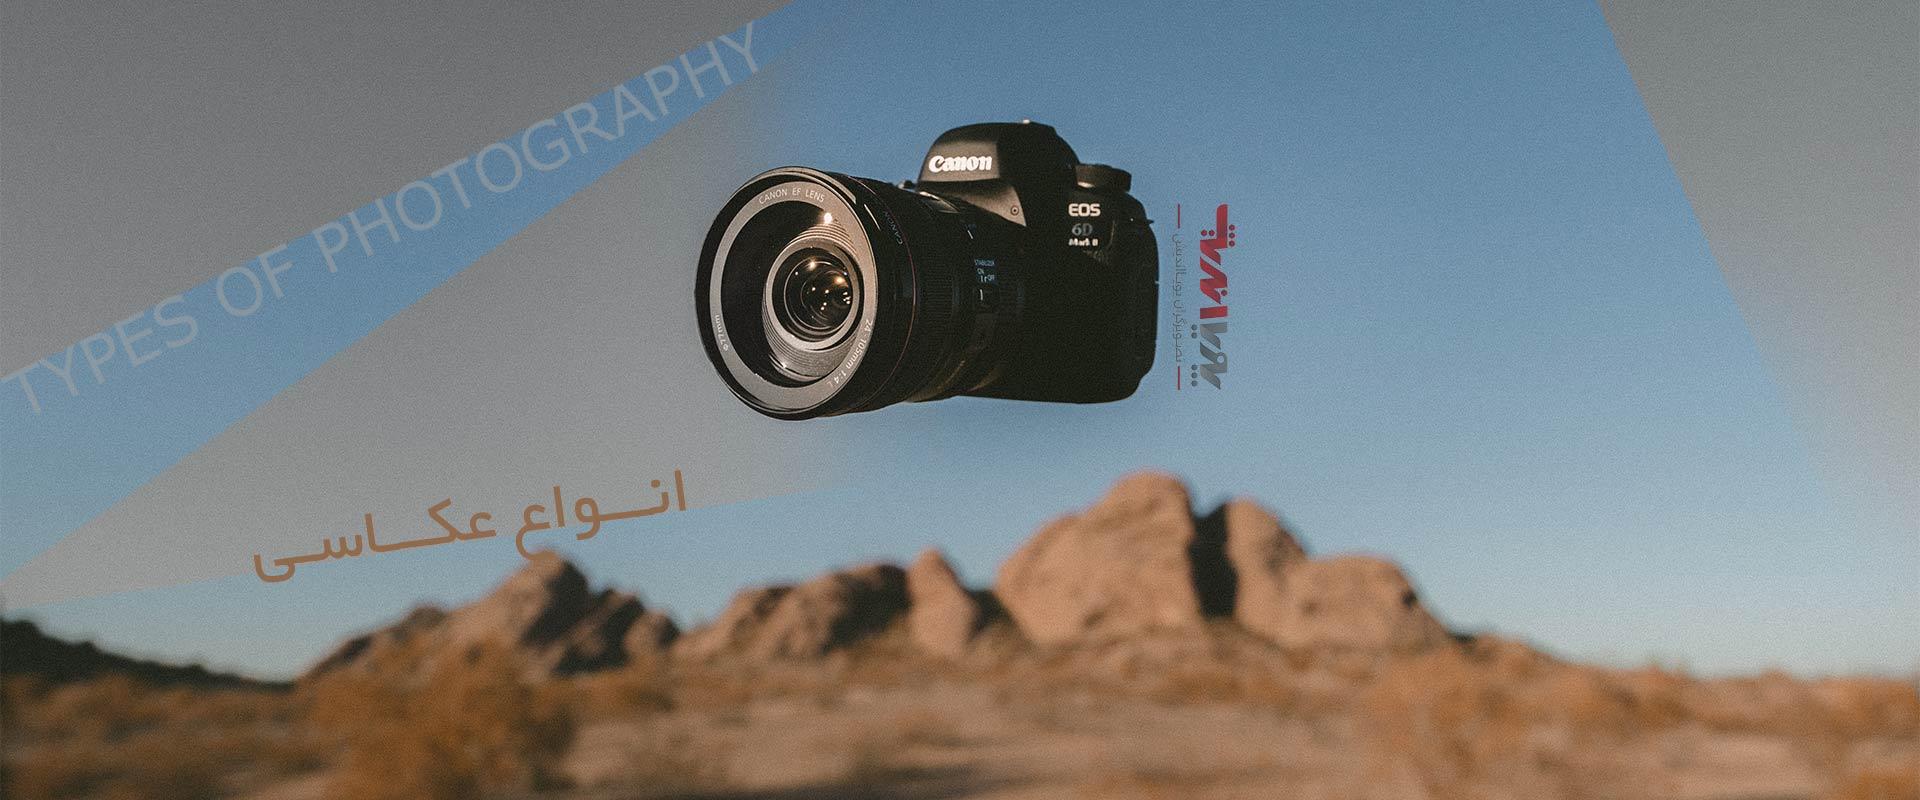 types of photography article - 24 مورد از انواع عکاسی که هرکدام از آنها جهان را زیباتر کرده است